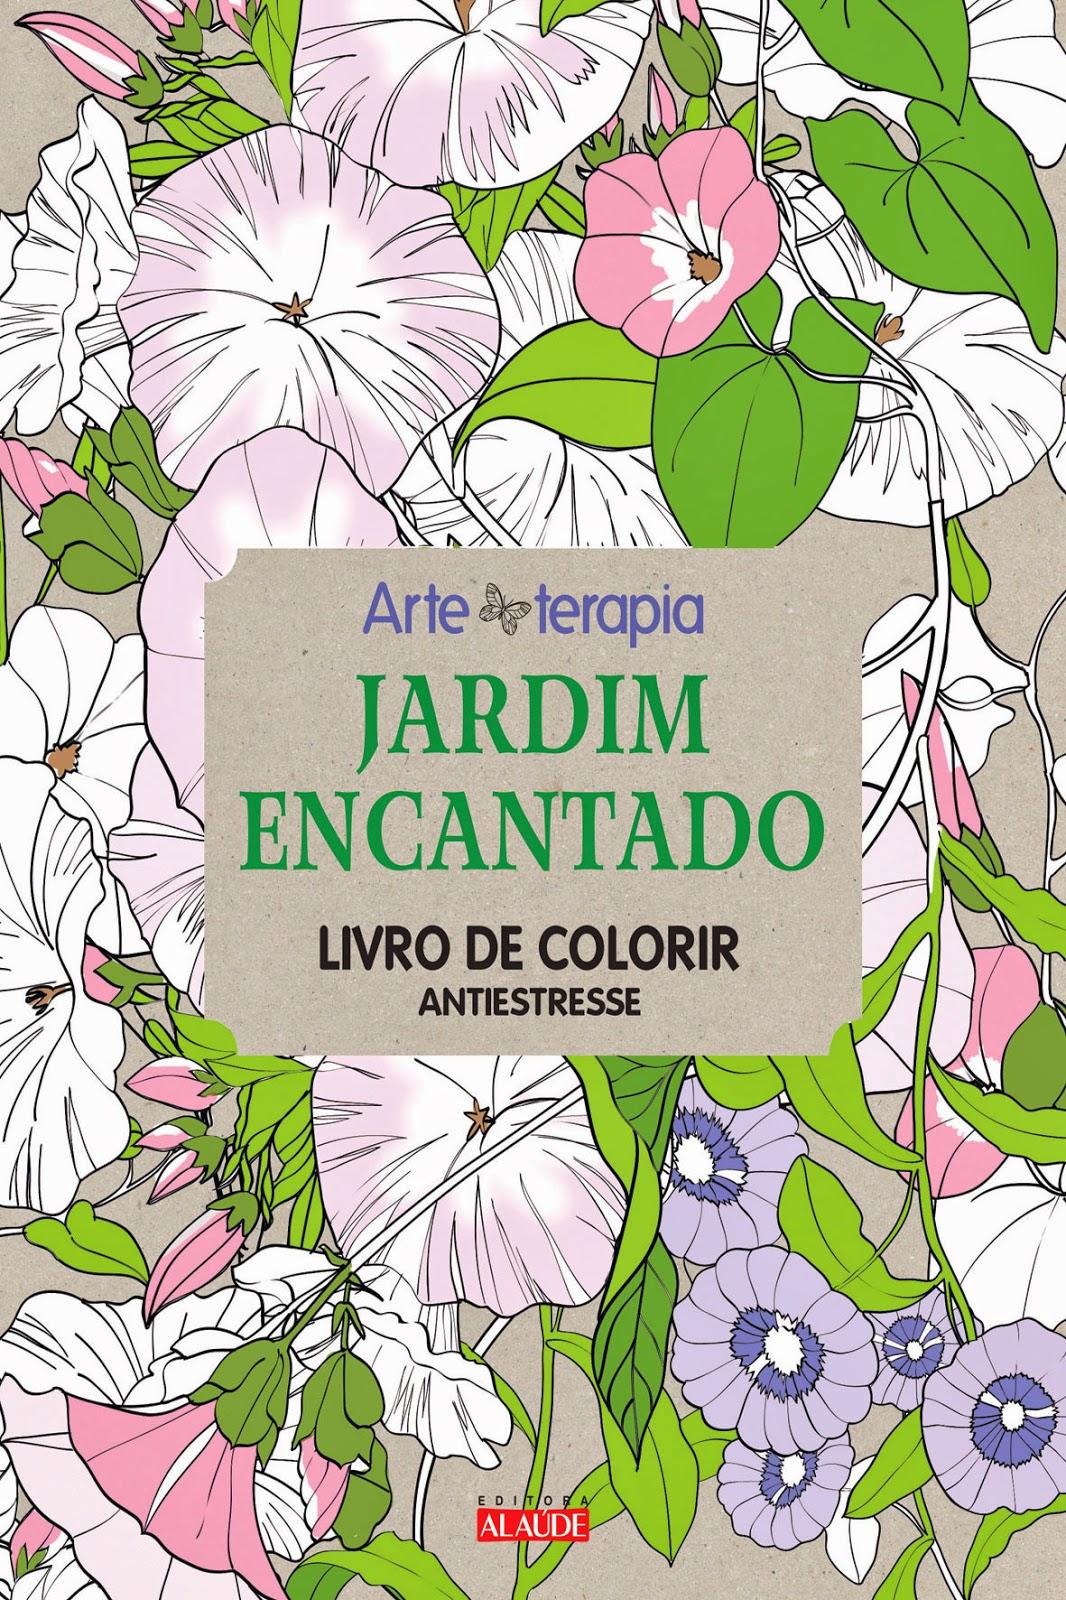 Estante da Nine Jardim encantado livro de colorir antiestresse de #77AB20 1066x1600